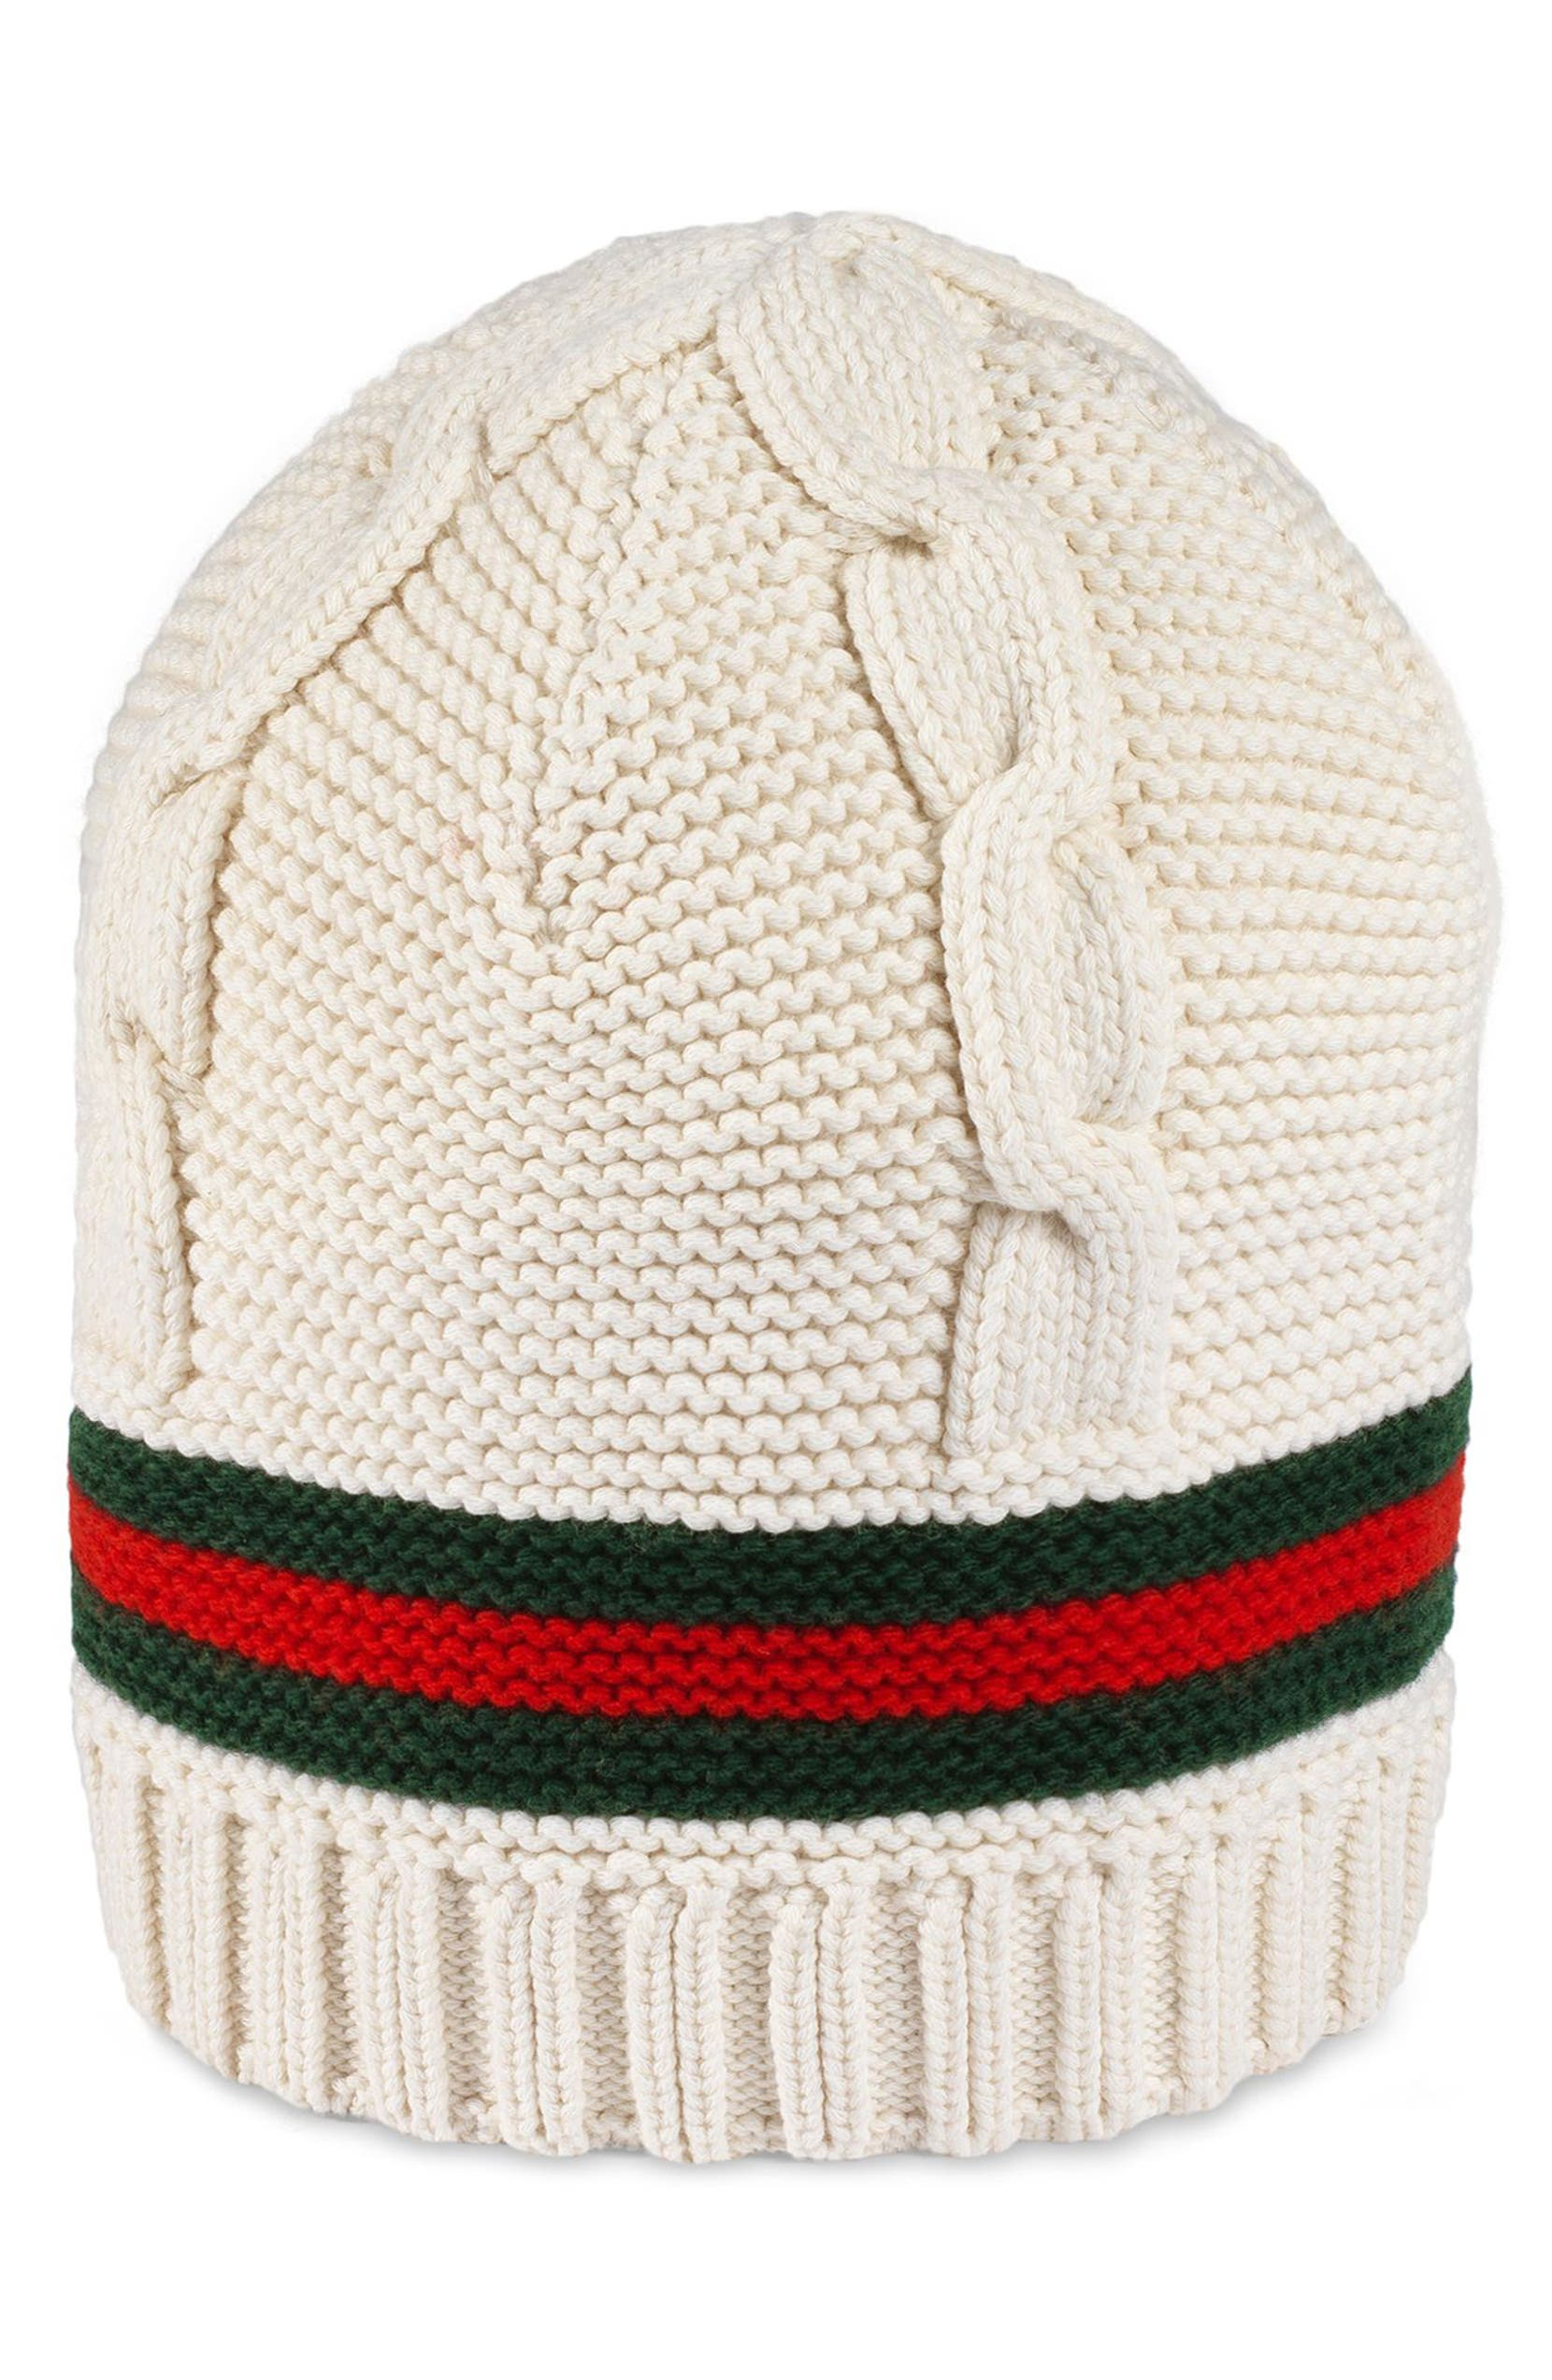 43bb6d99a82 Gucci Liom Cable Knit Beanie